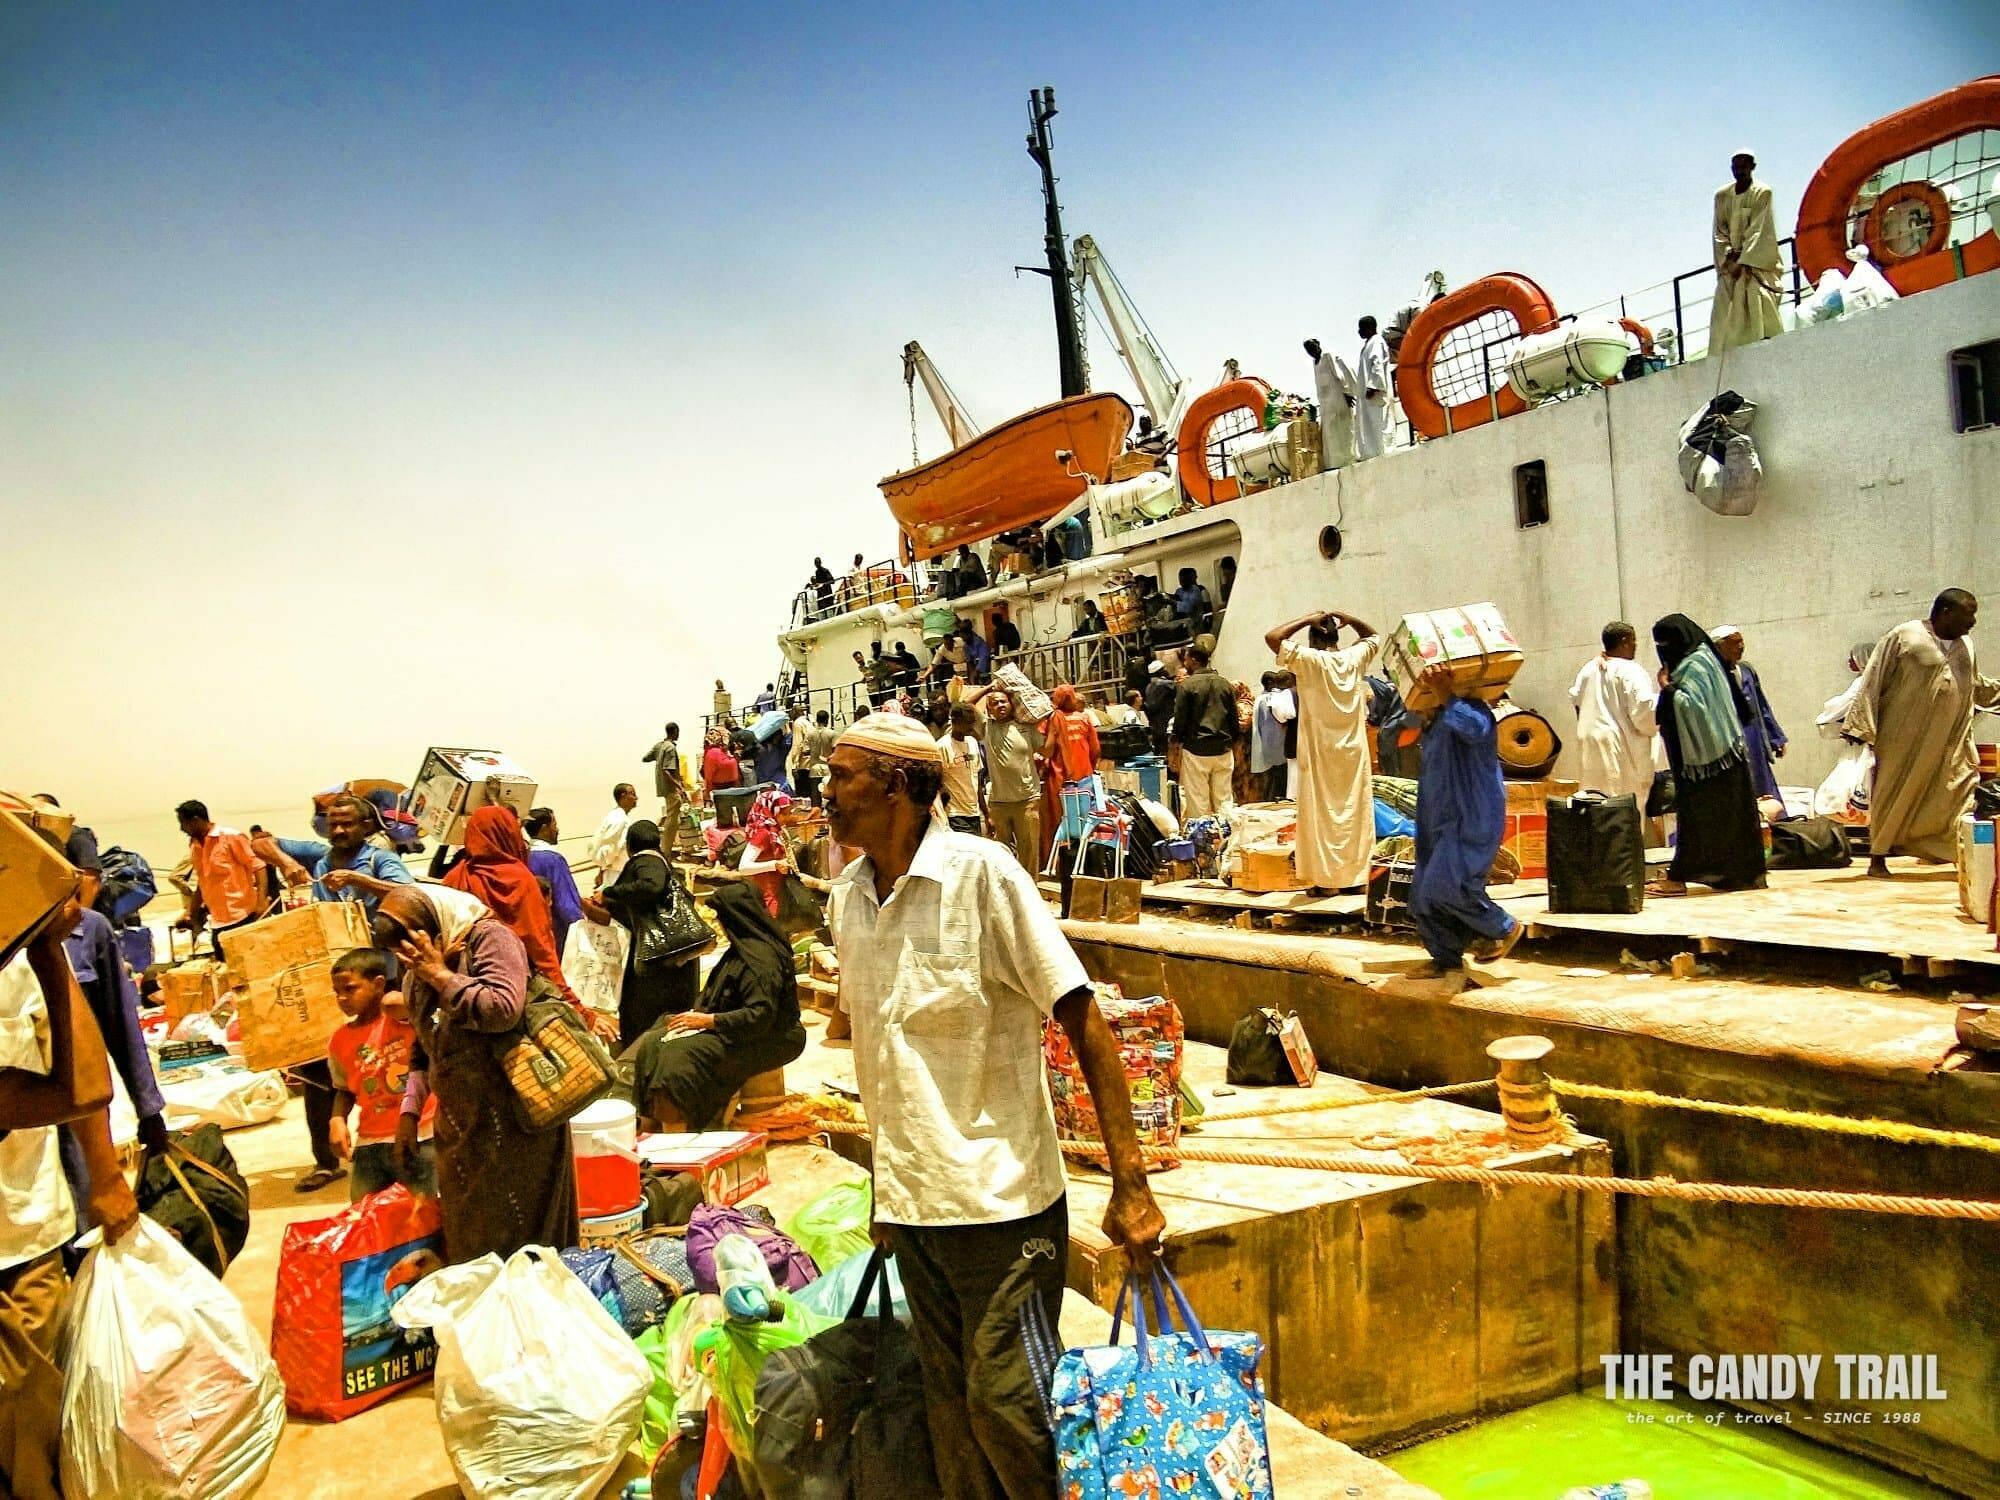 passengers disembarking ship at the port of Wadi Halfa sudan